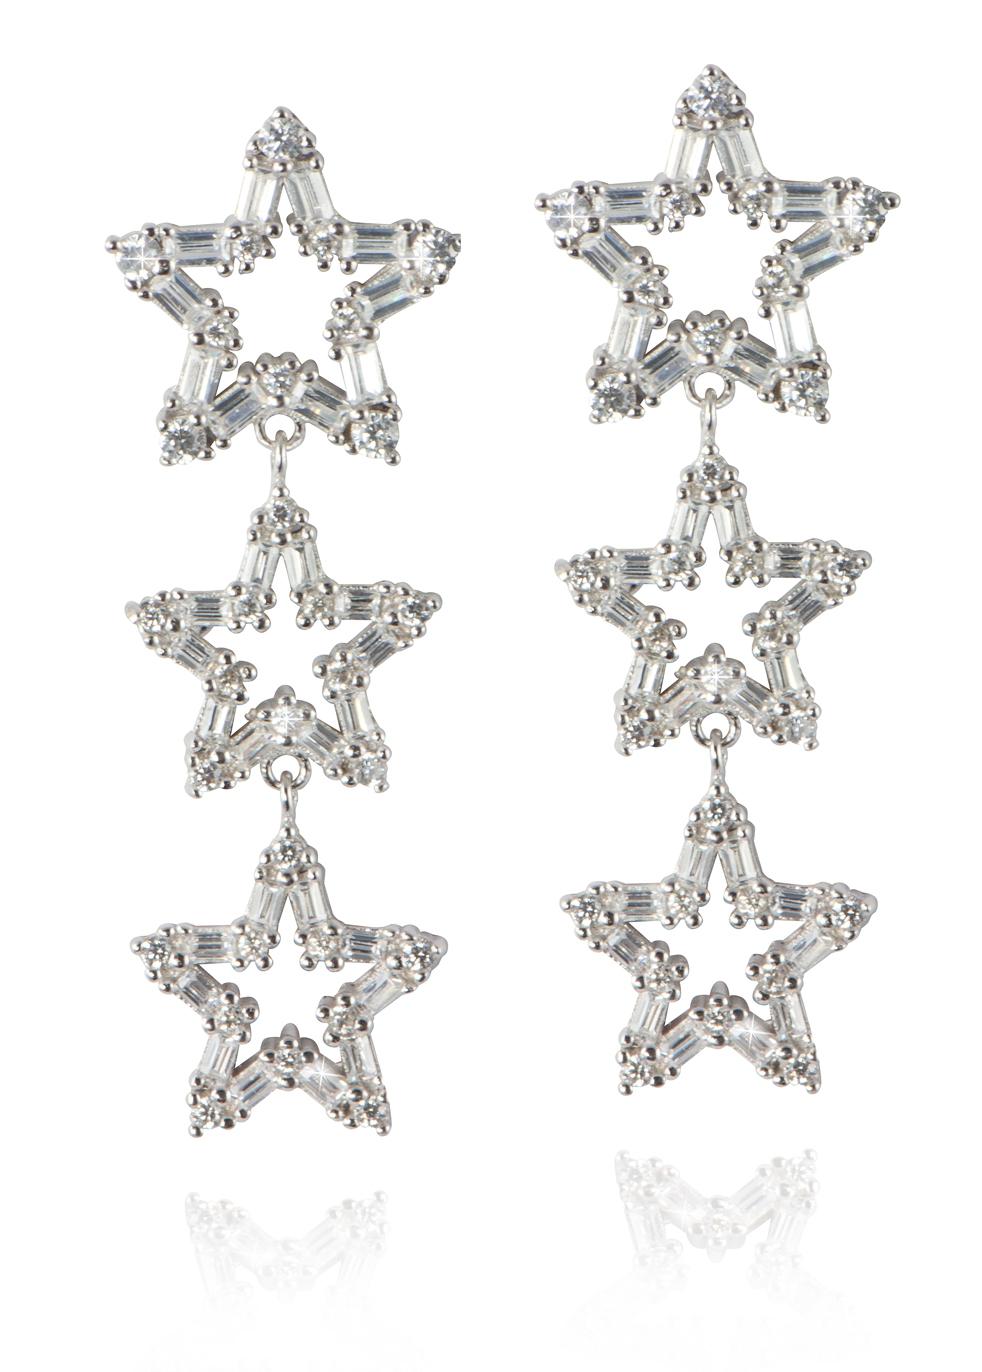 APPLES & FIGS THREE STARS EARRINGS